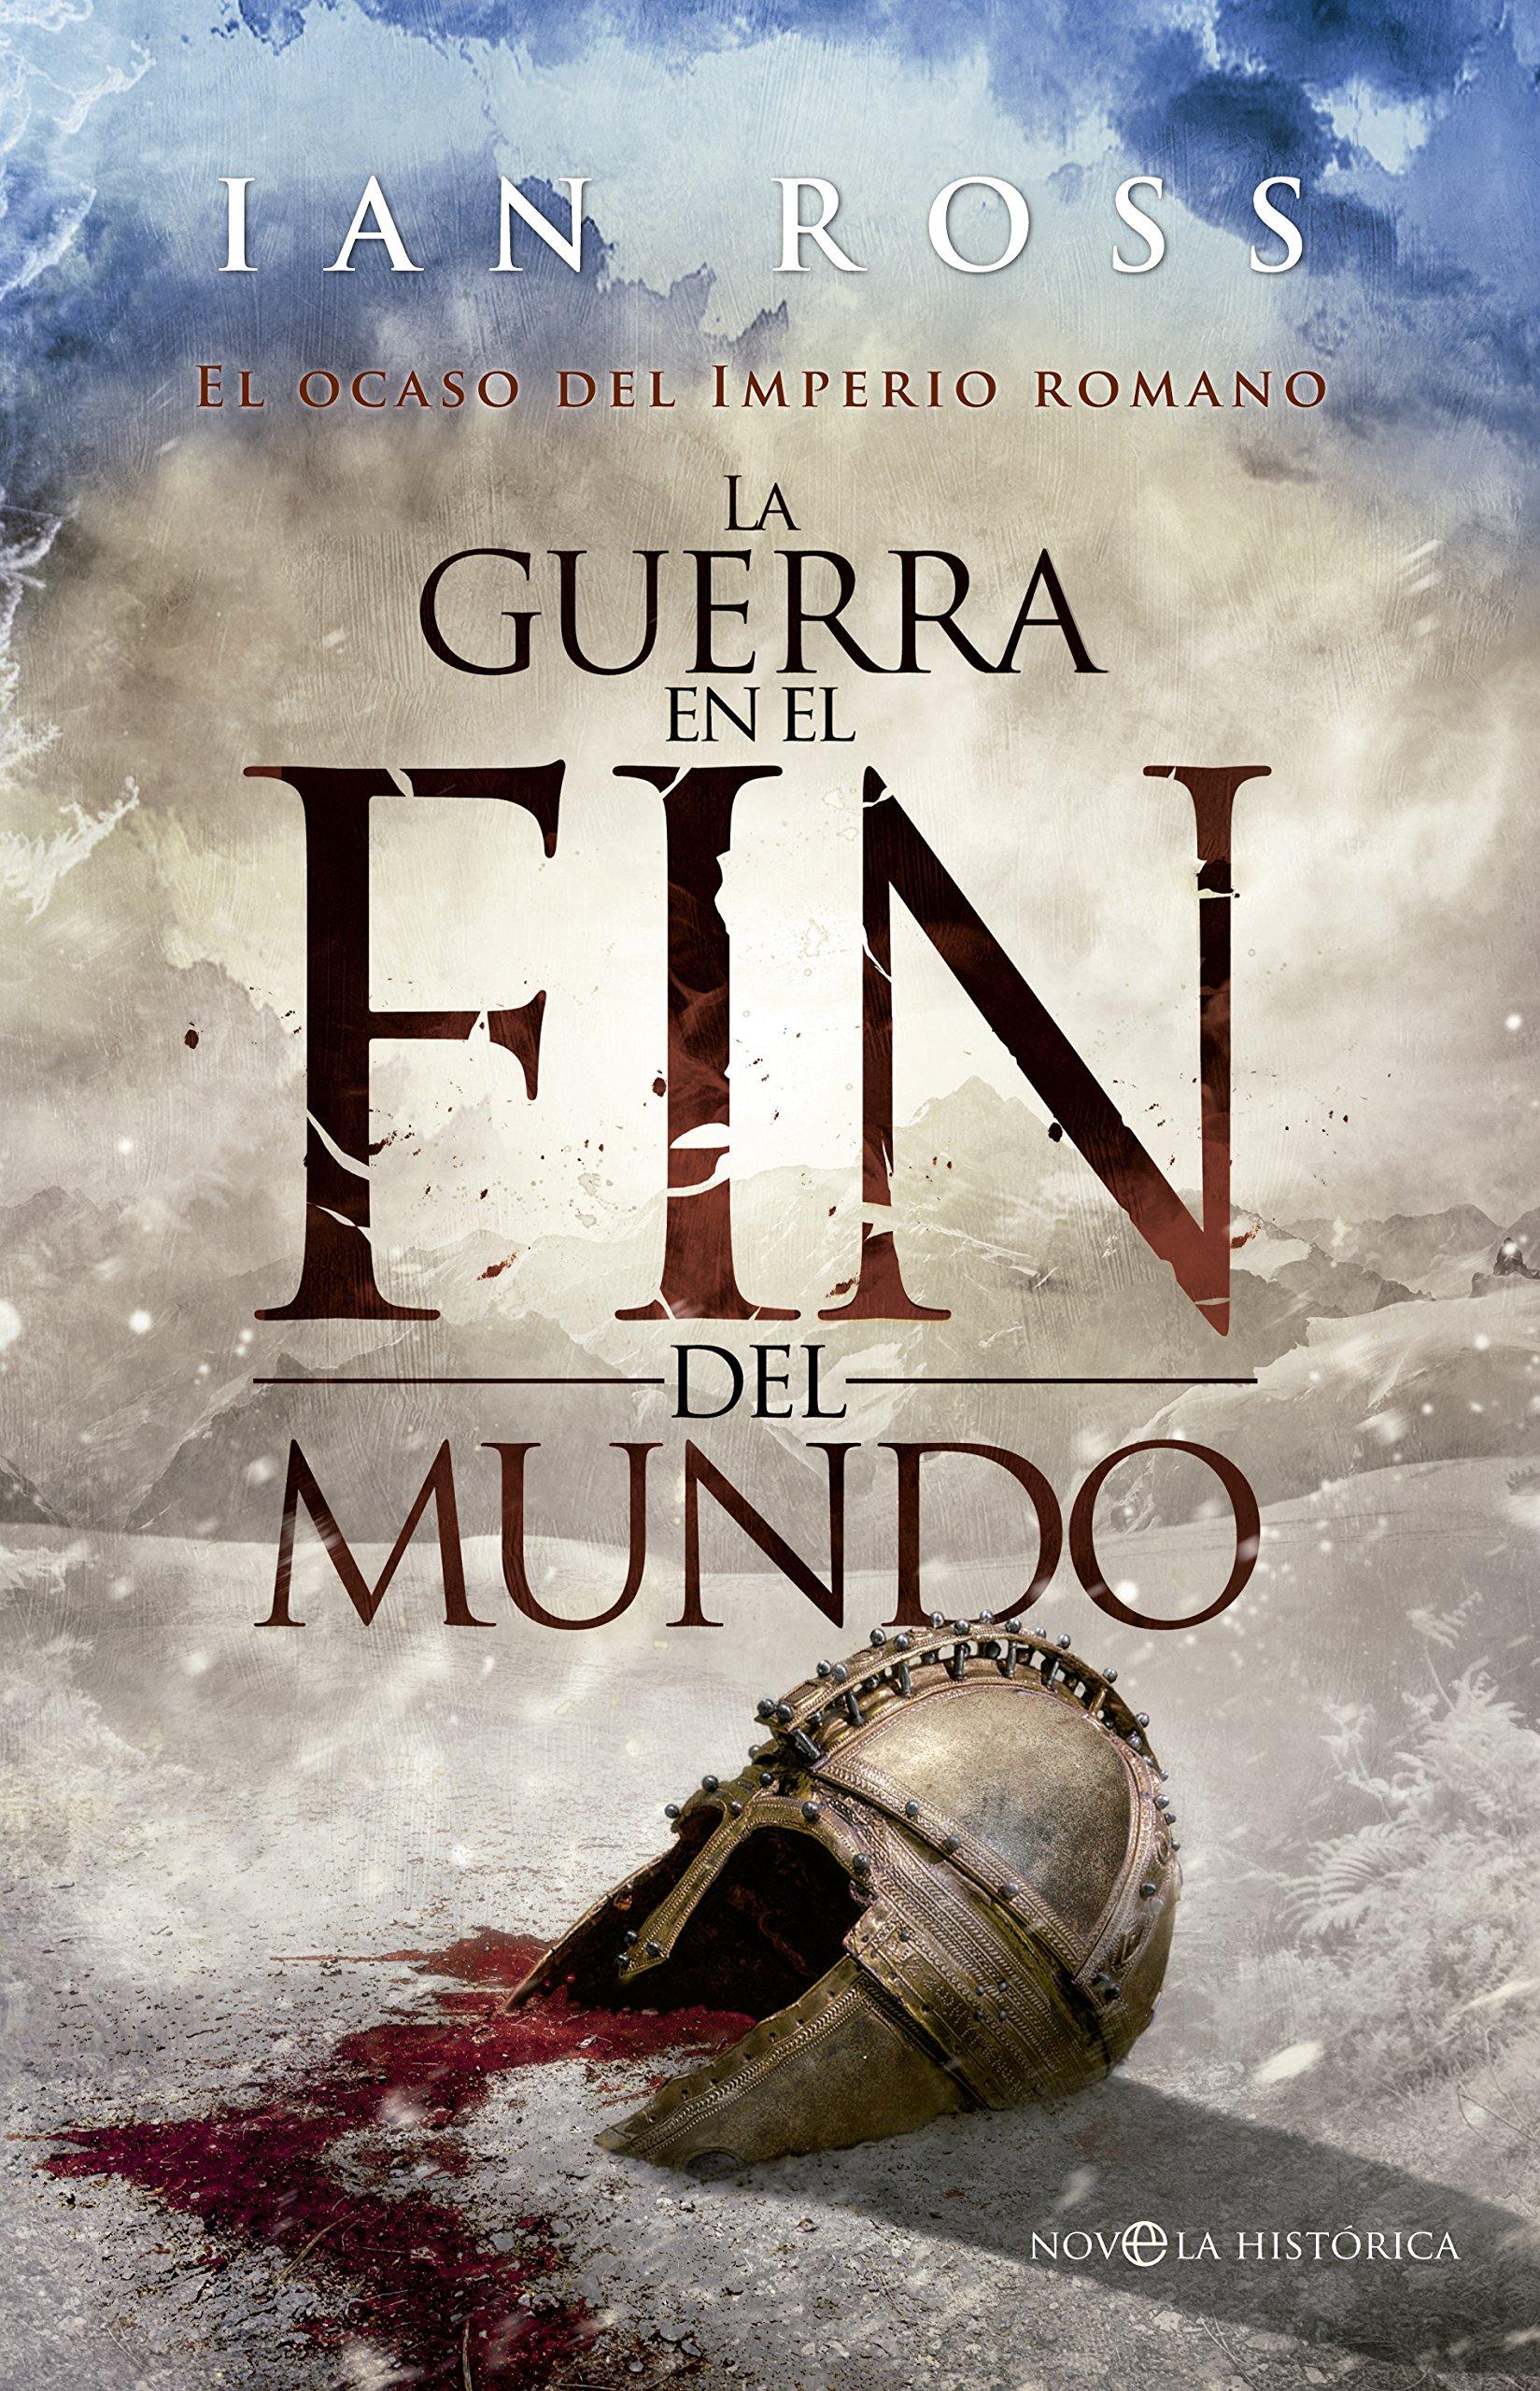 La Guerra En El Fin Del Mundo (Novela histórica): Amazon.es: Ian Ross, Isabel Murillo Fort: Libros